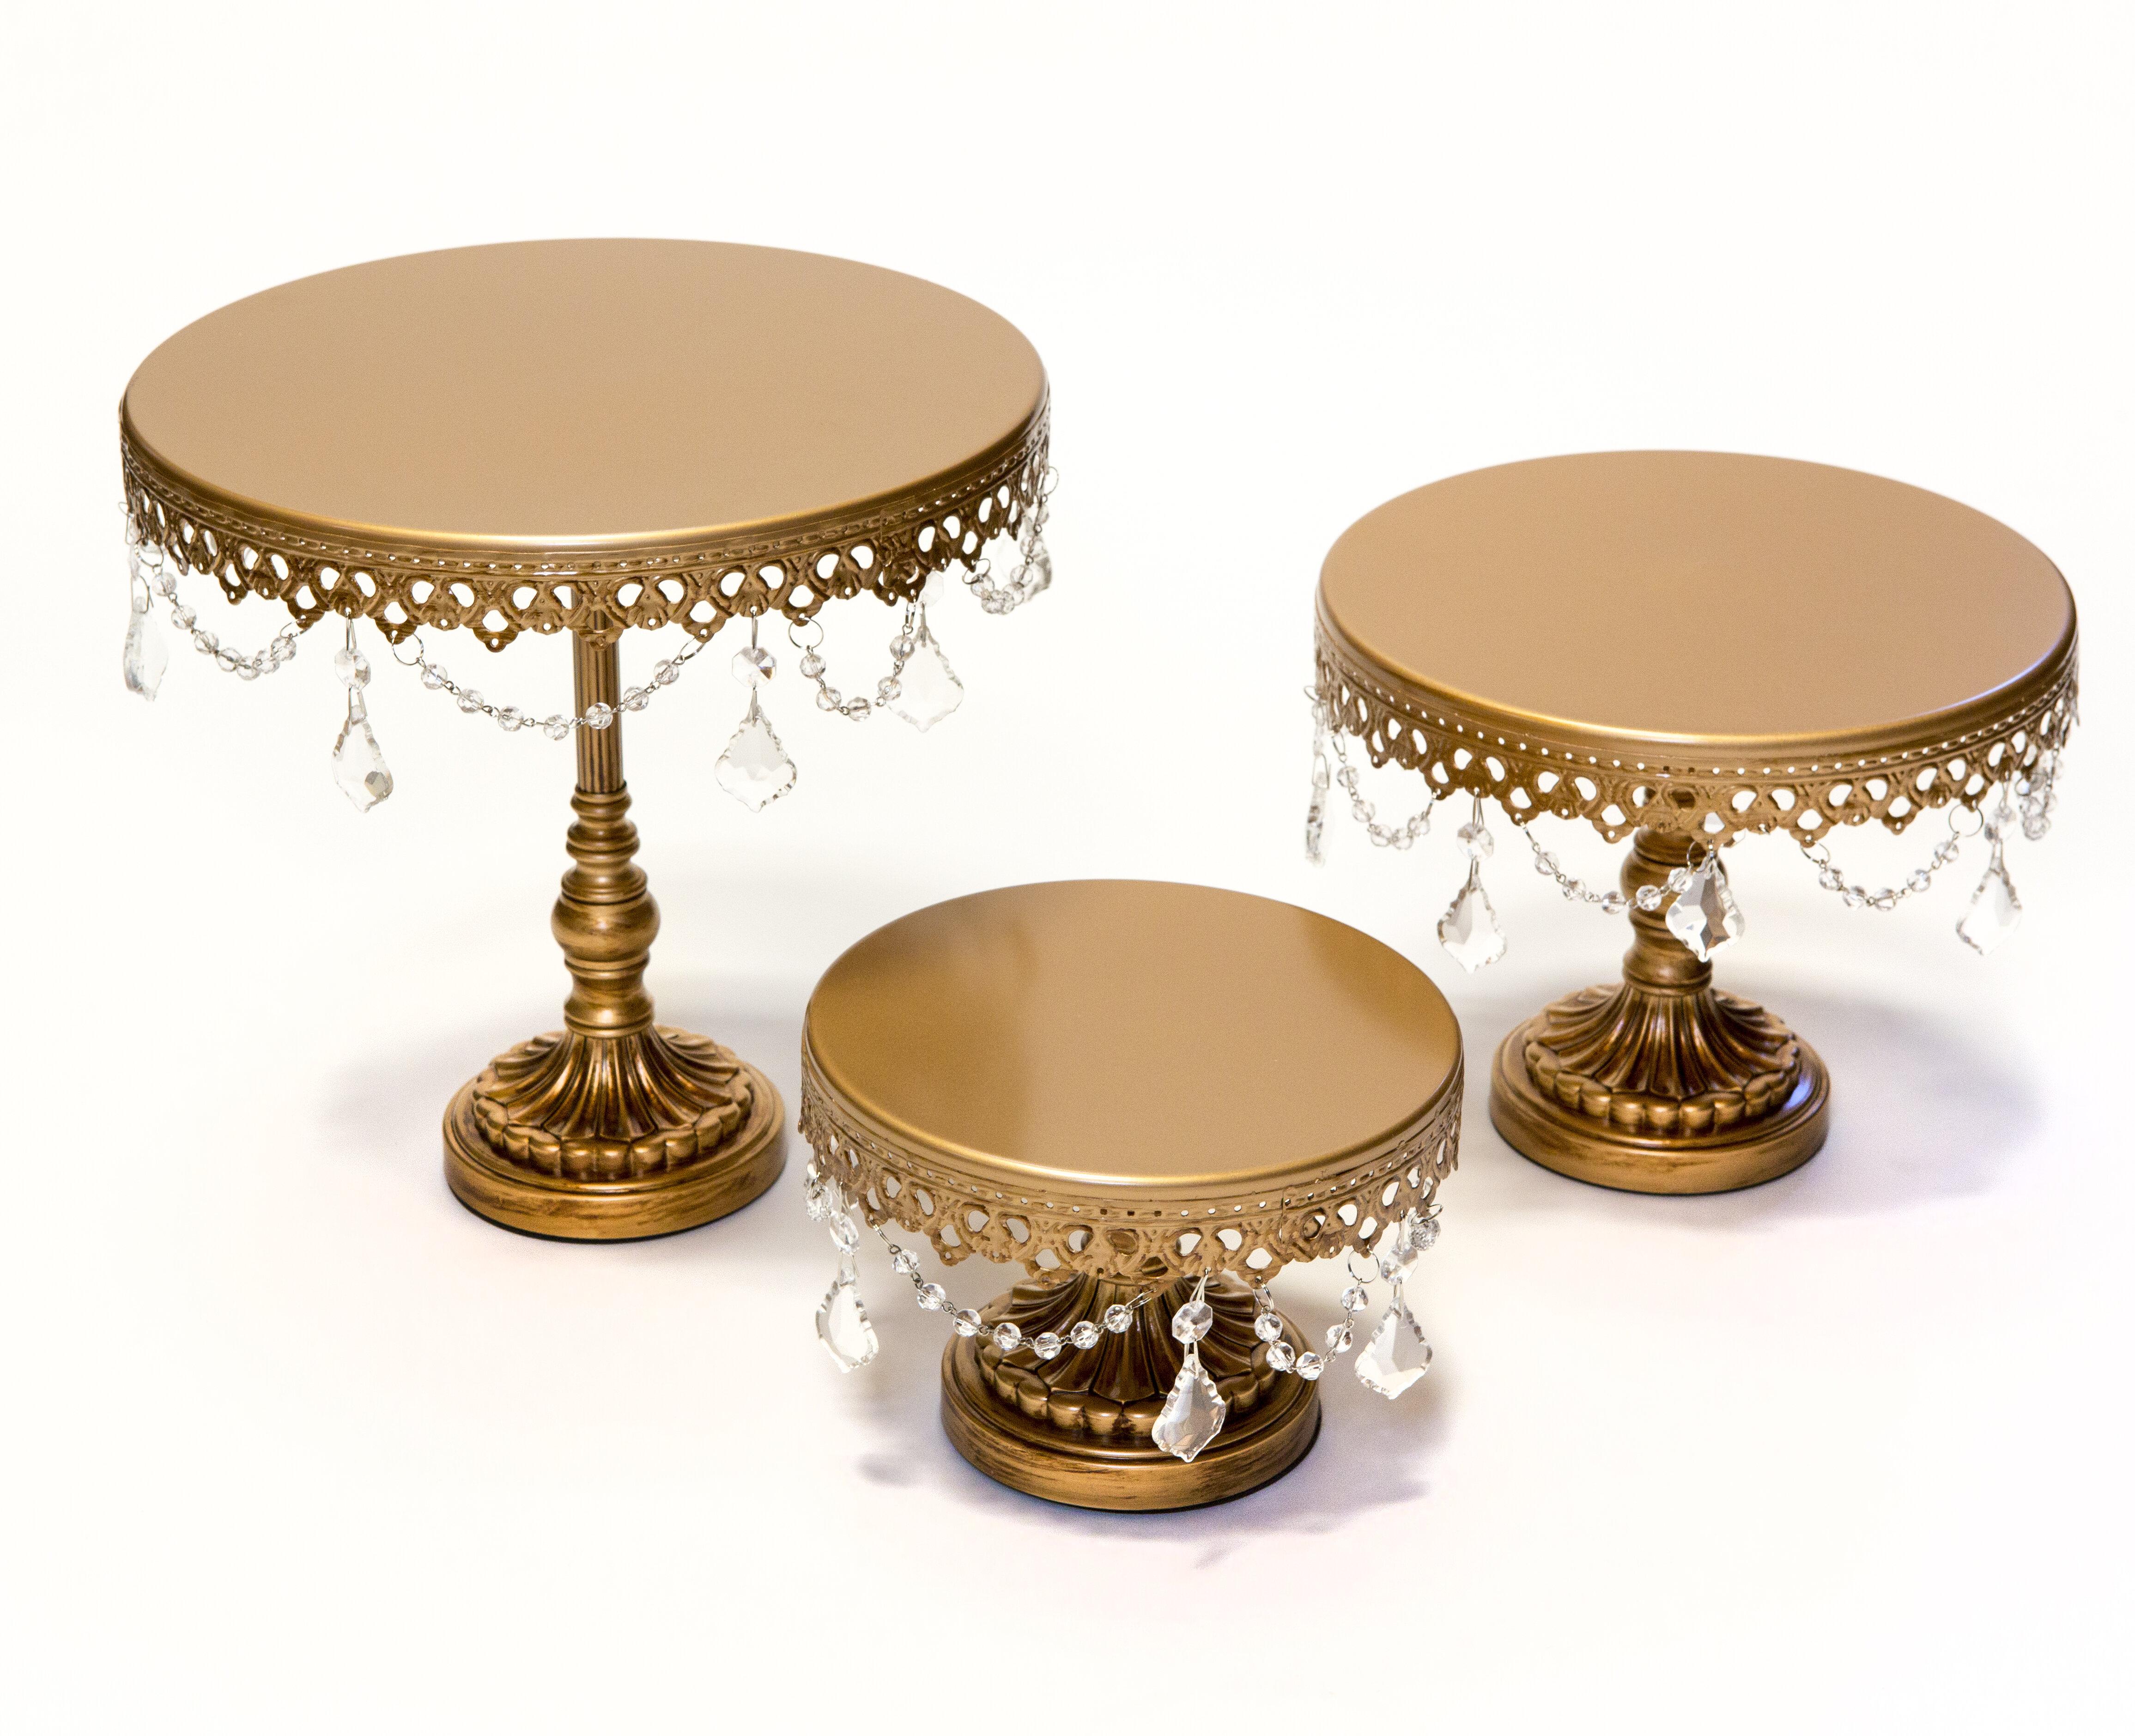 Opulent Treasures 3 Piece Chandelier Cake Plate Stand Set u0026 Reviews | Wayfair  sc 1 st  Wayfair & Opulent Treasures 3 Piece Chandelier Cake Plate Stand Set u0026 Reviews ...